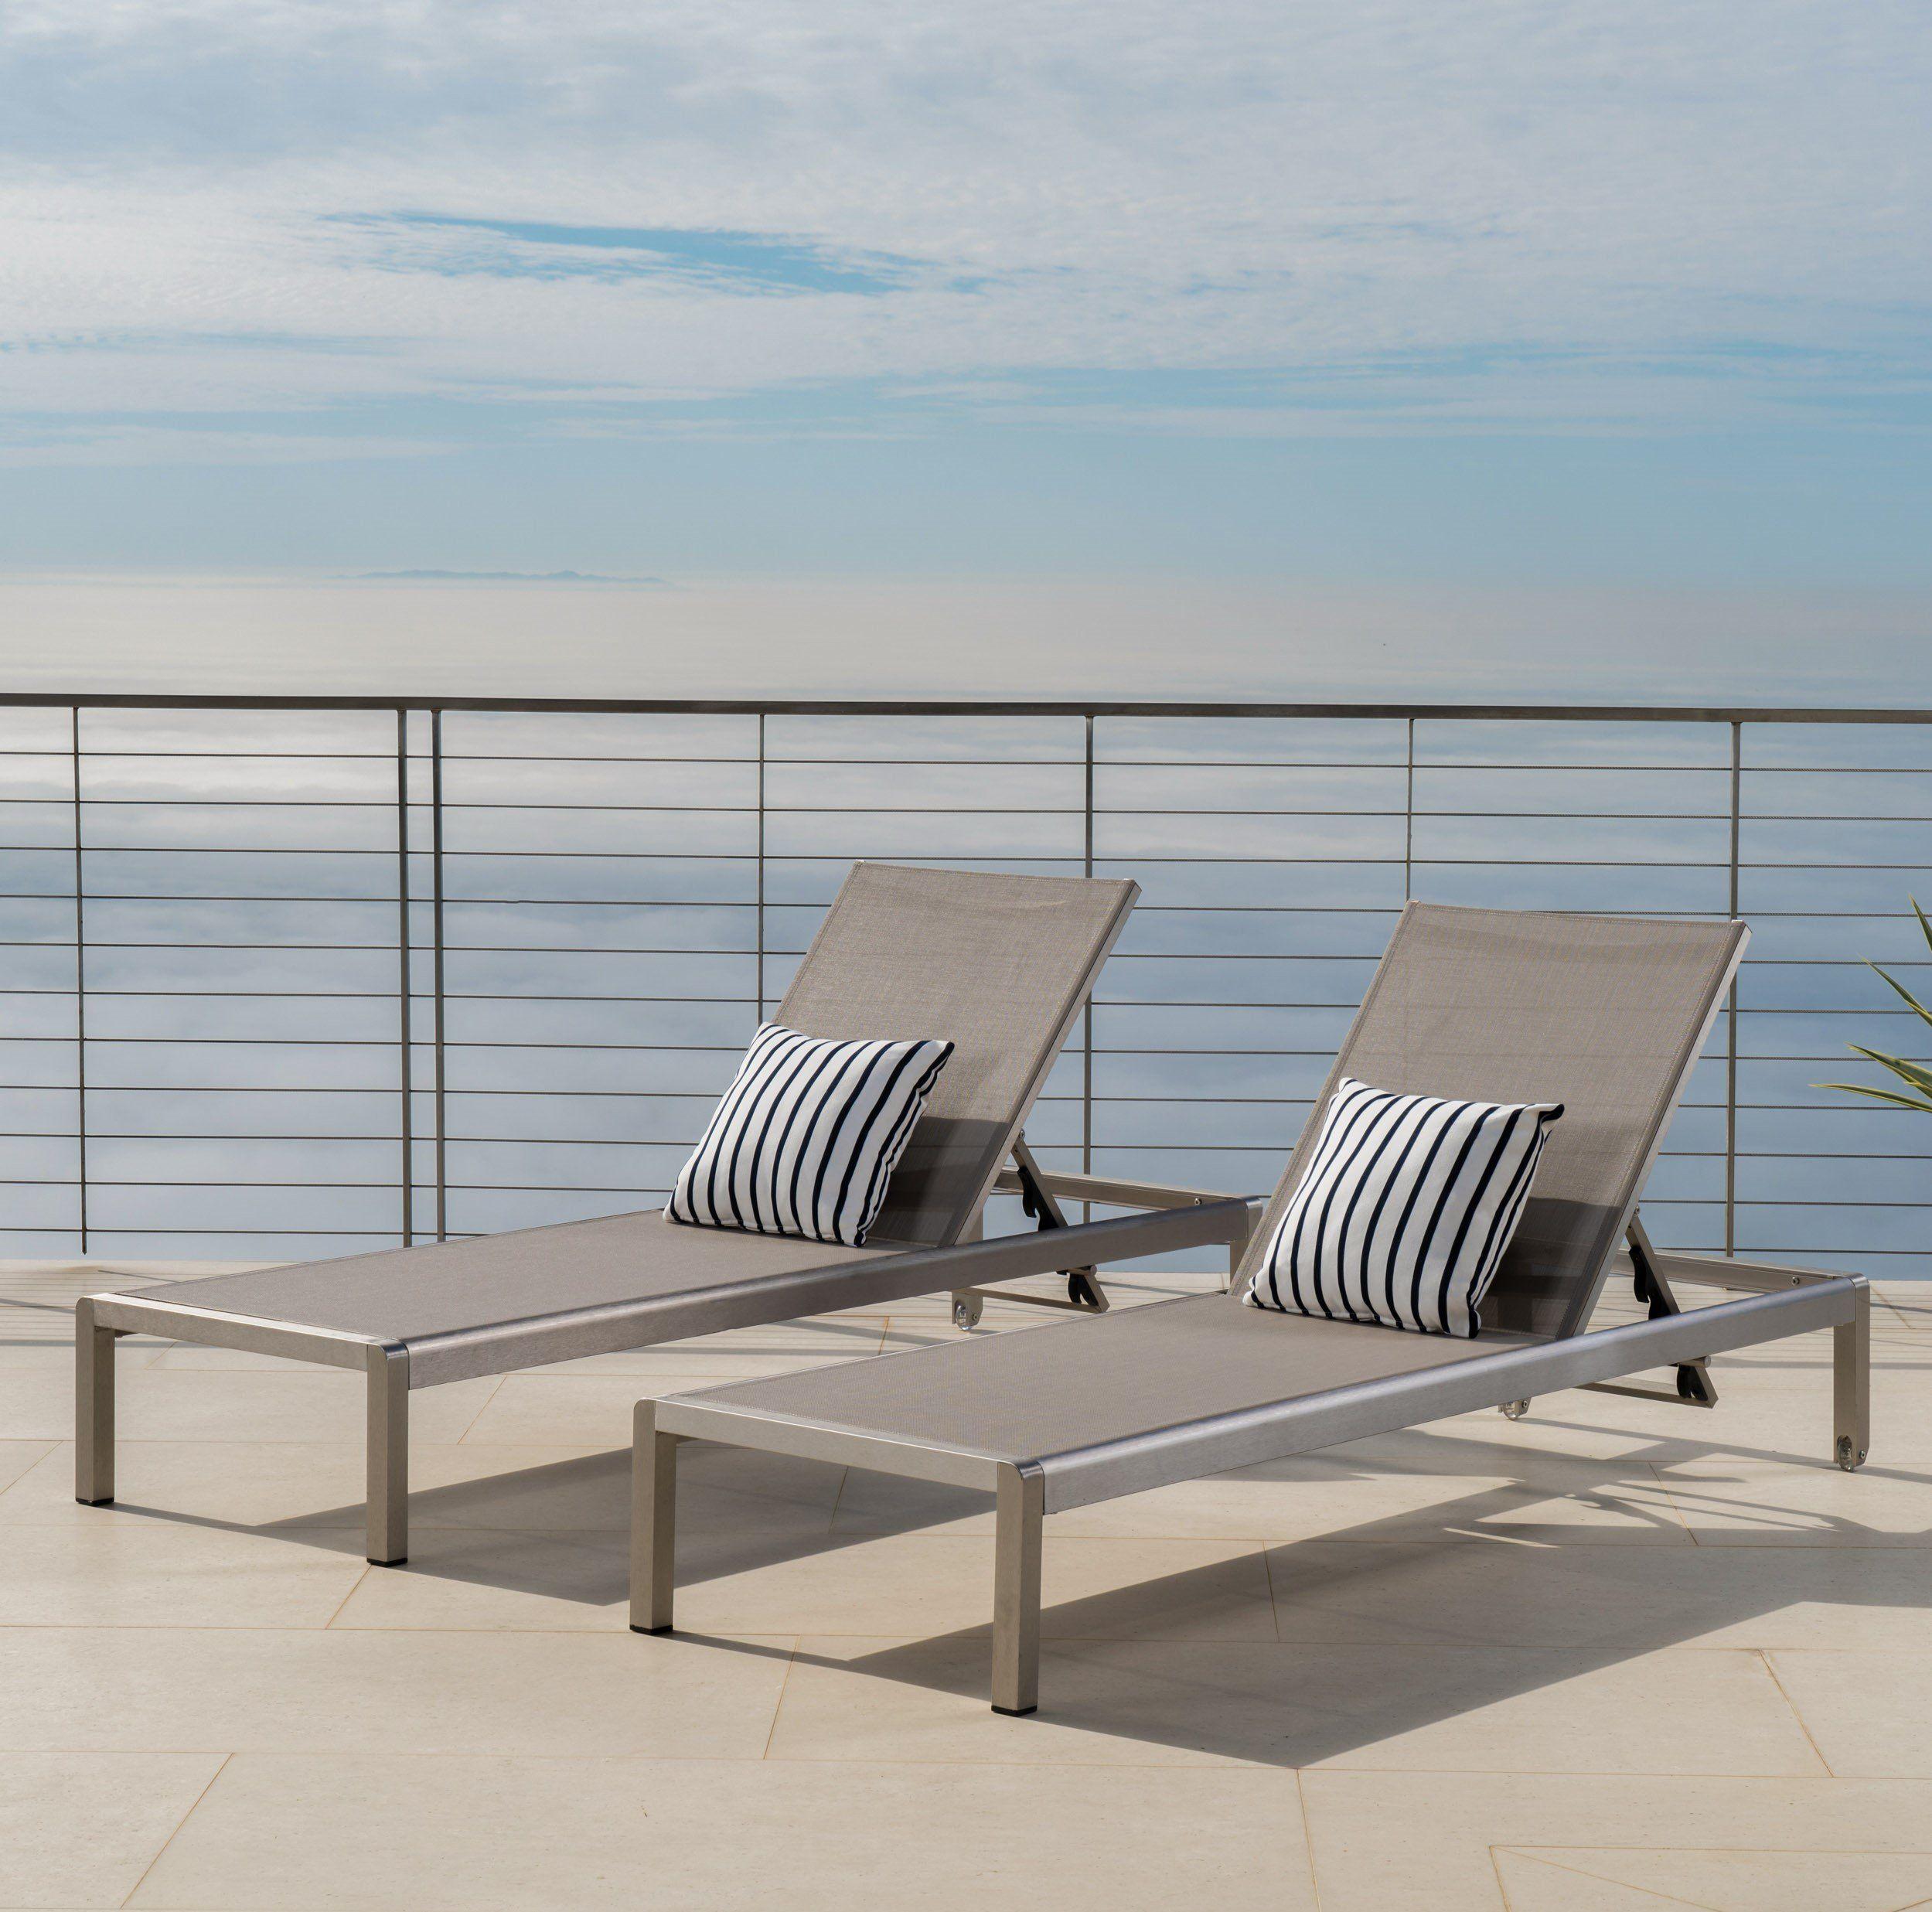 56eb0da76a1d372eb411c297411a0062 Impressionnant De Ensemble Table Chaise Concept